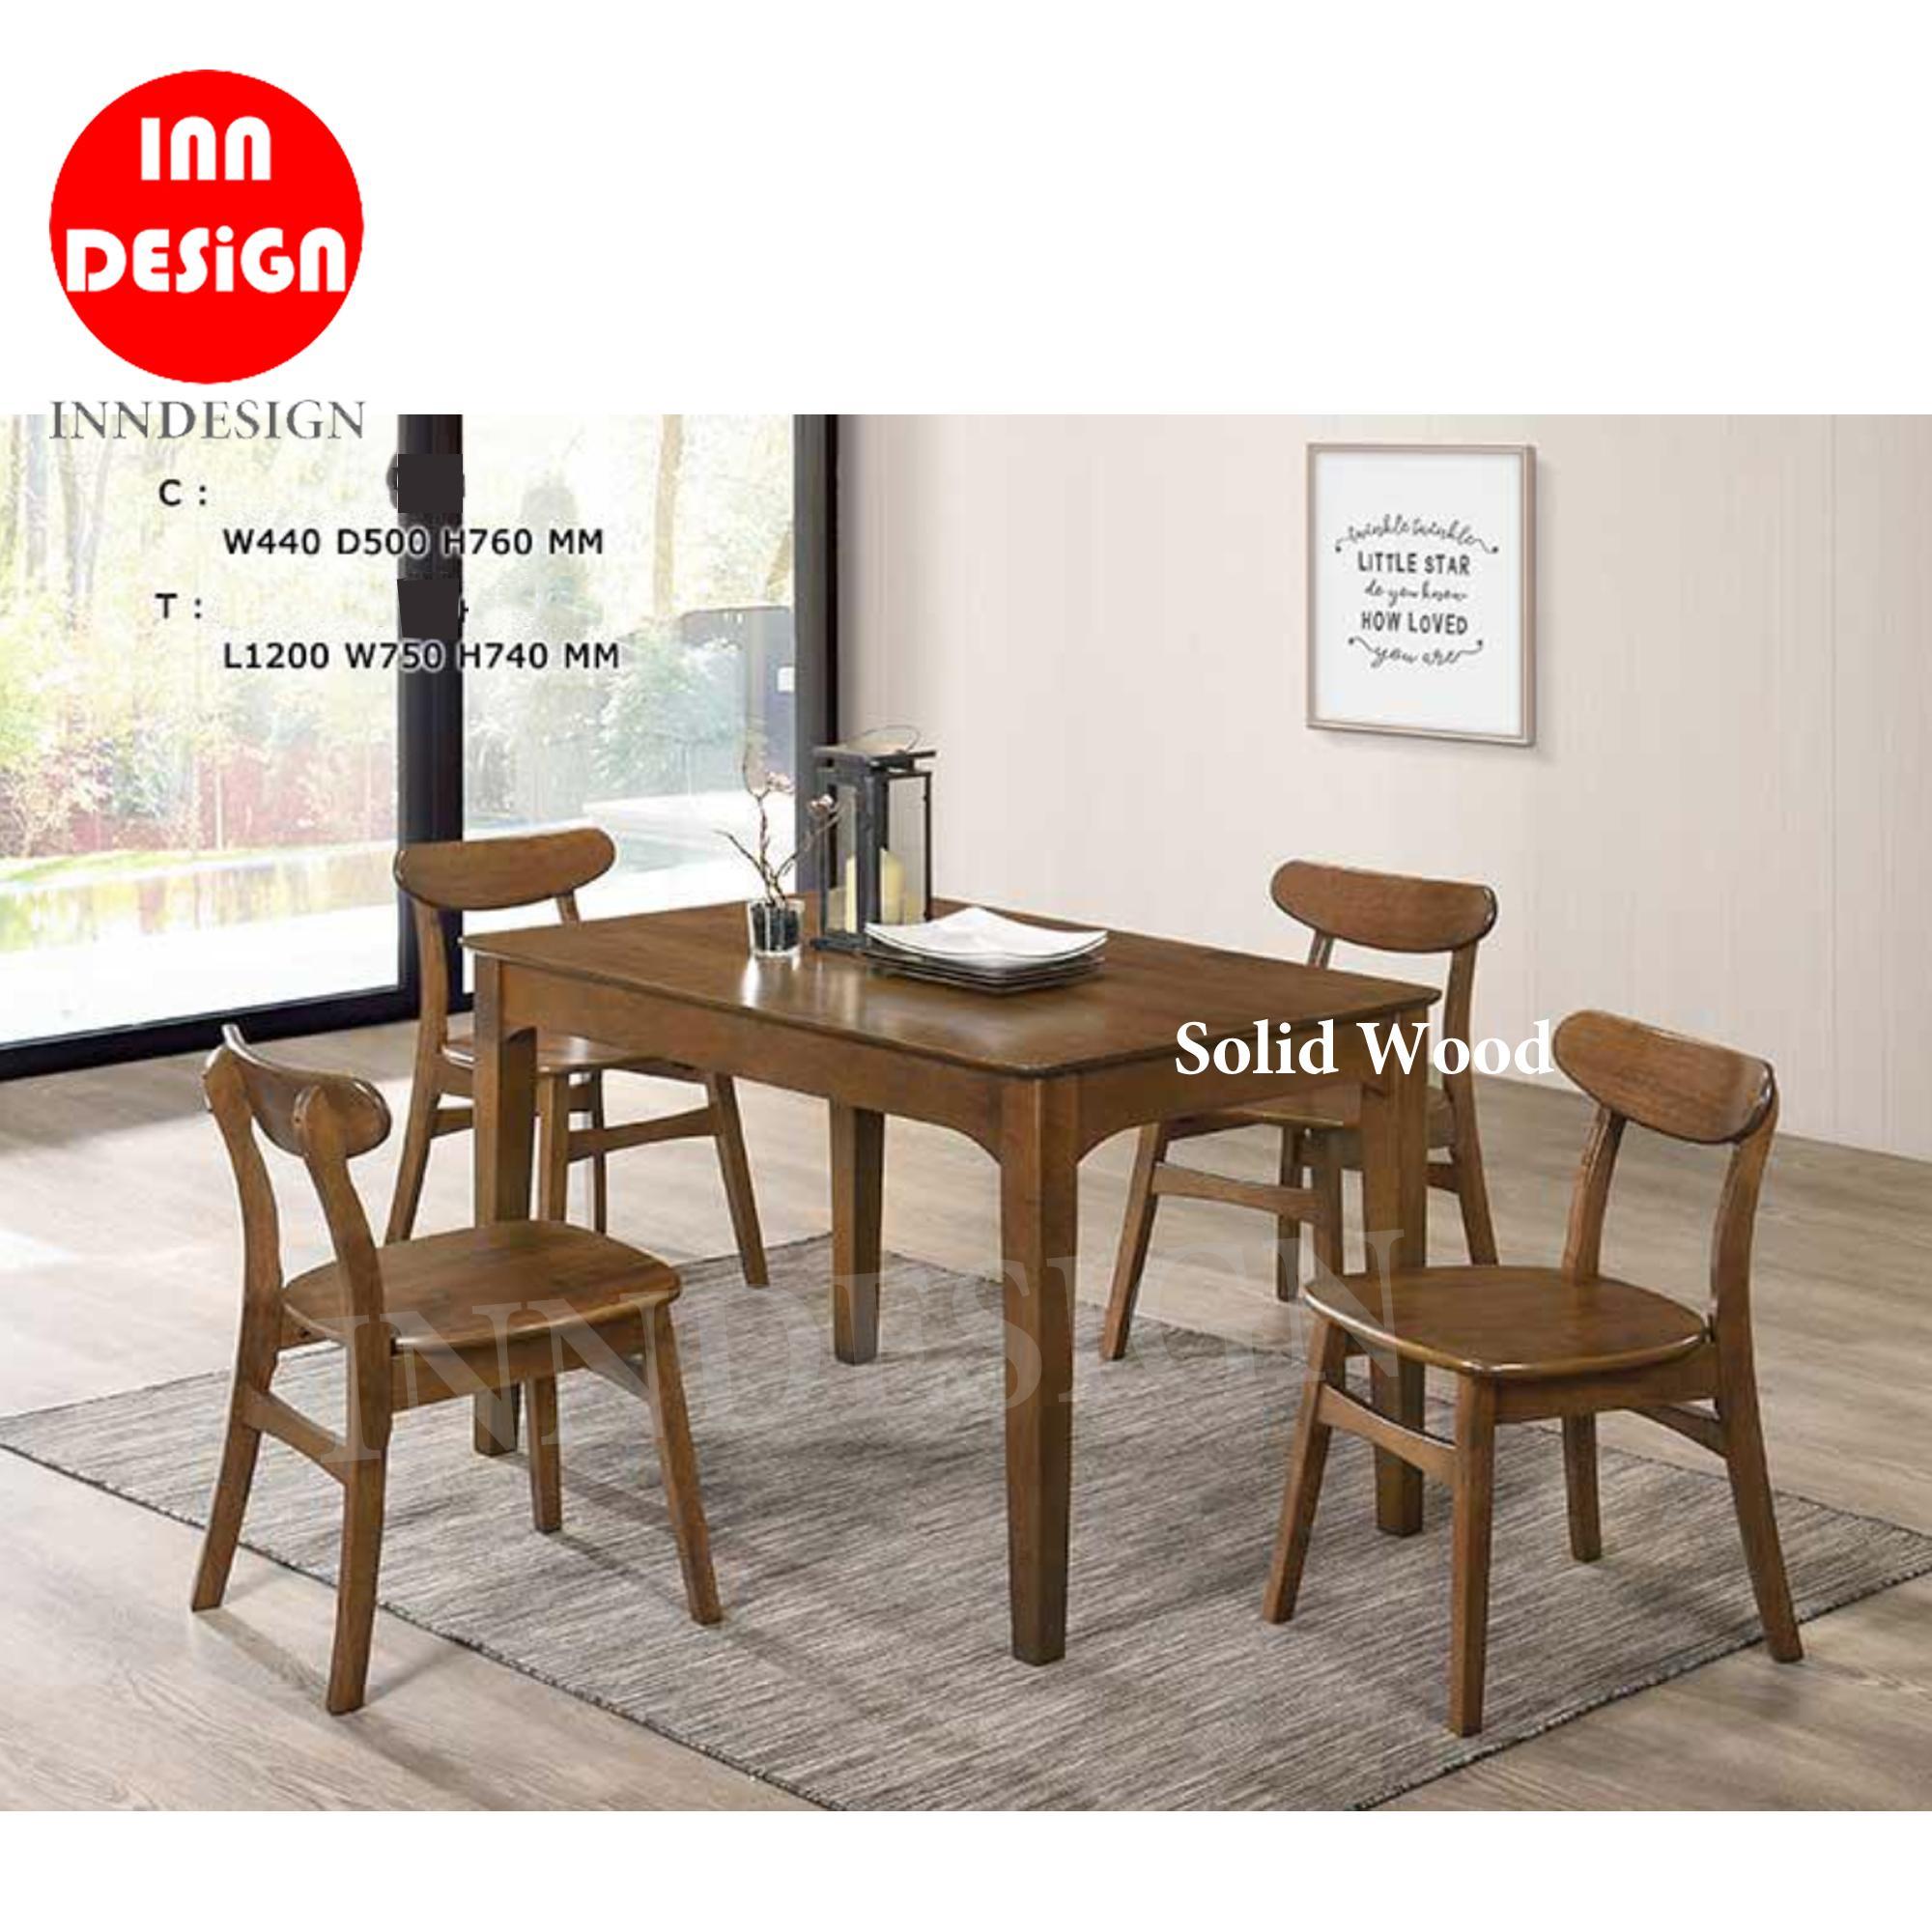 Hamis 1+4 Dining Set (100% Solid Wood) (Free Installation)